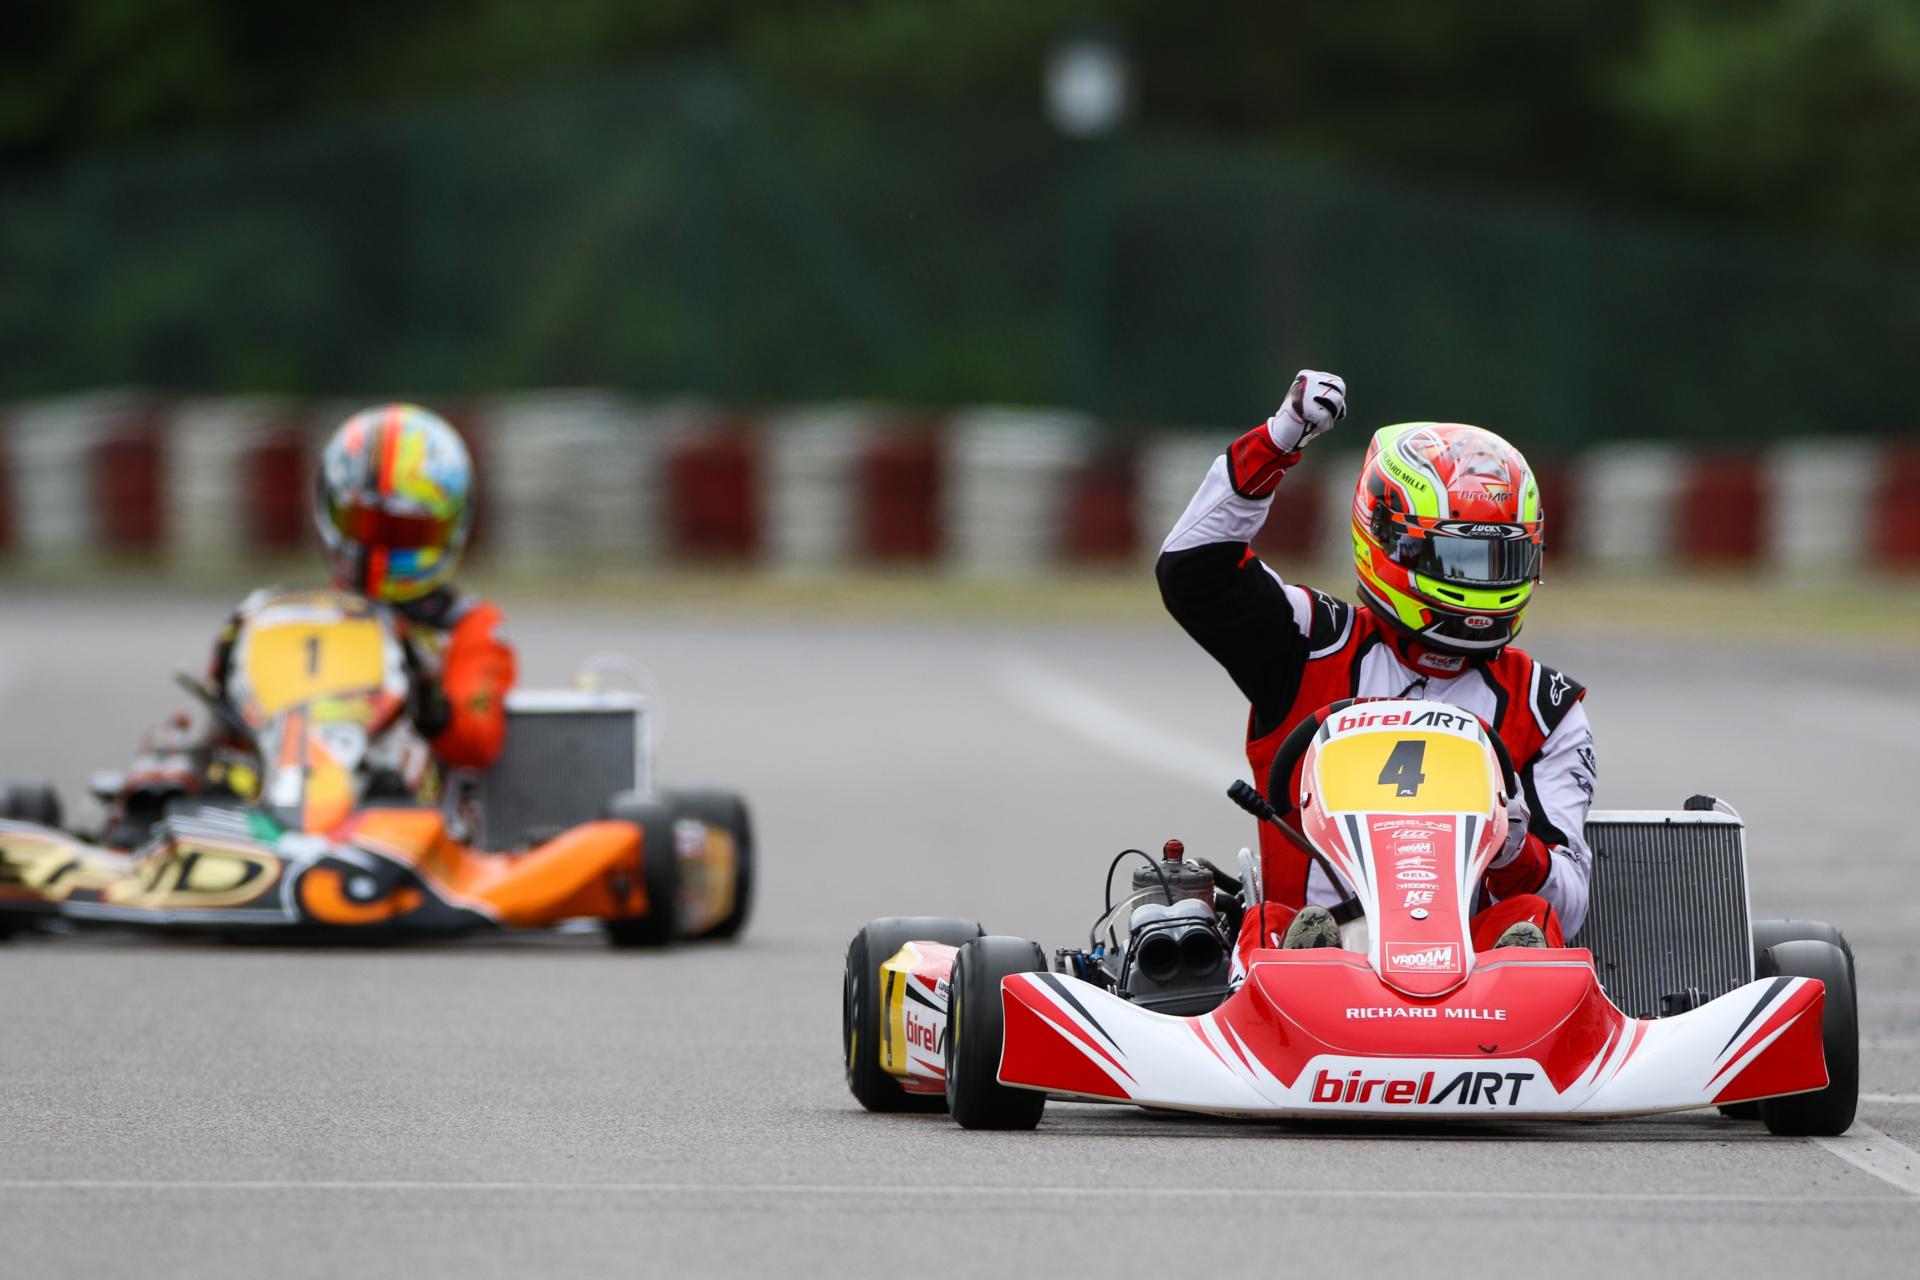 FIA Karting European Championship, Wackersdorf - Victories for Longhi (KZ) and Van Walstijn (KZ2)